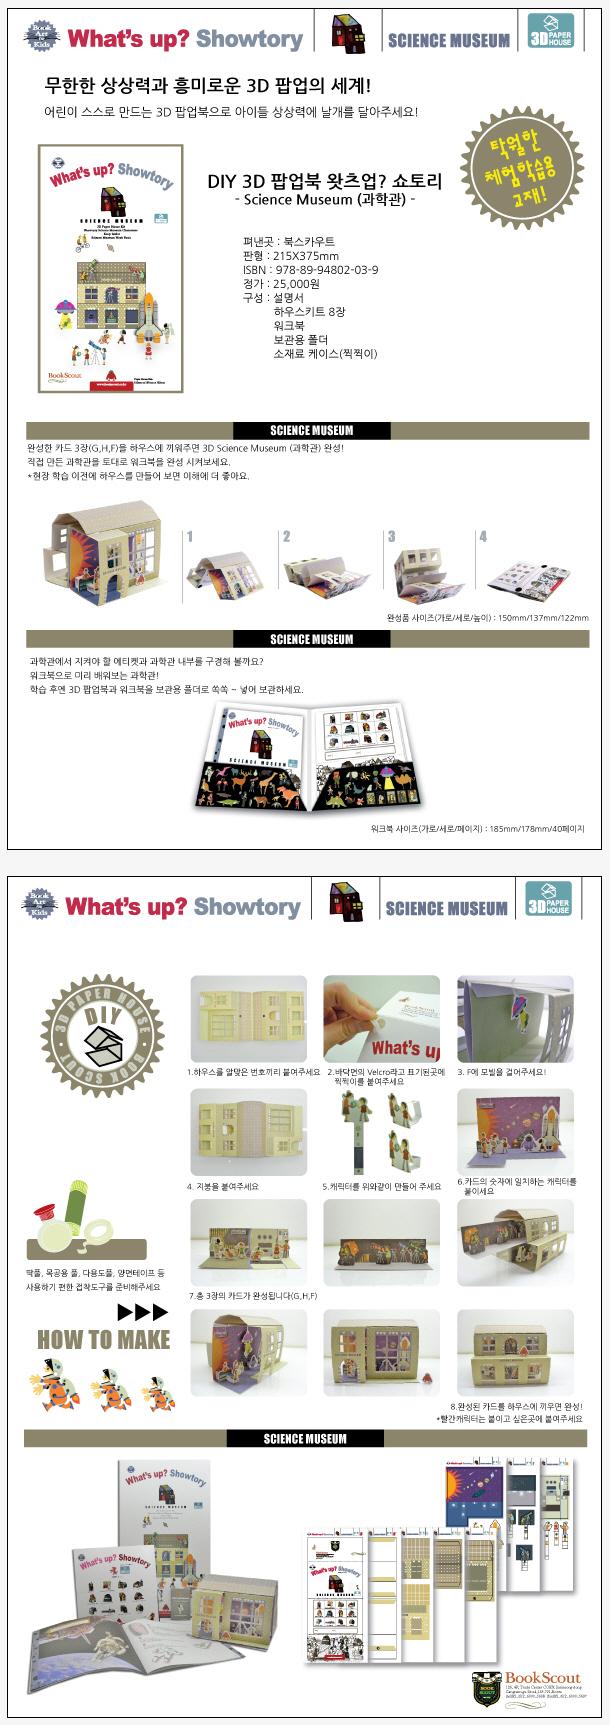 WHATS UP SHOWTORY: SCIENCE MUSEUM(왓츠업 쇼토리: 과학관)(3D팝업북)(팝업북) 도서 상세이미지